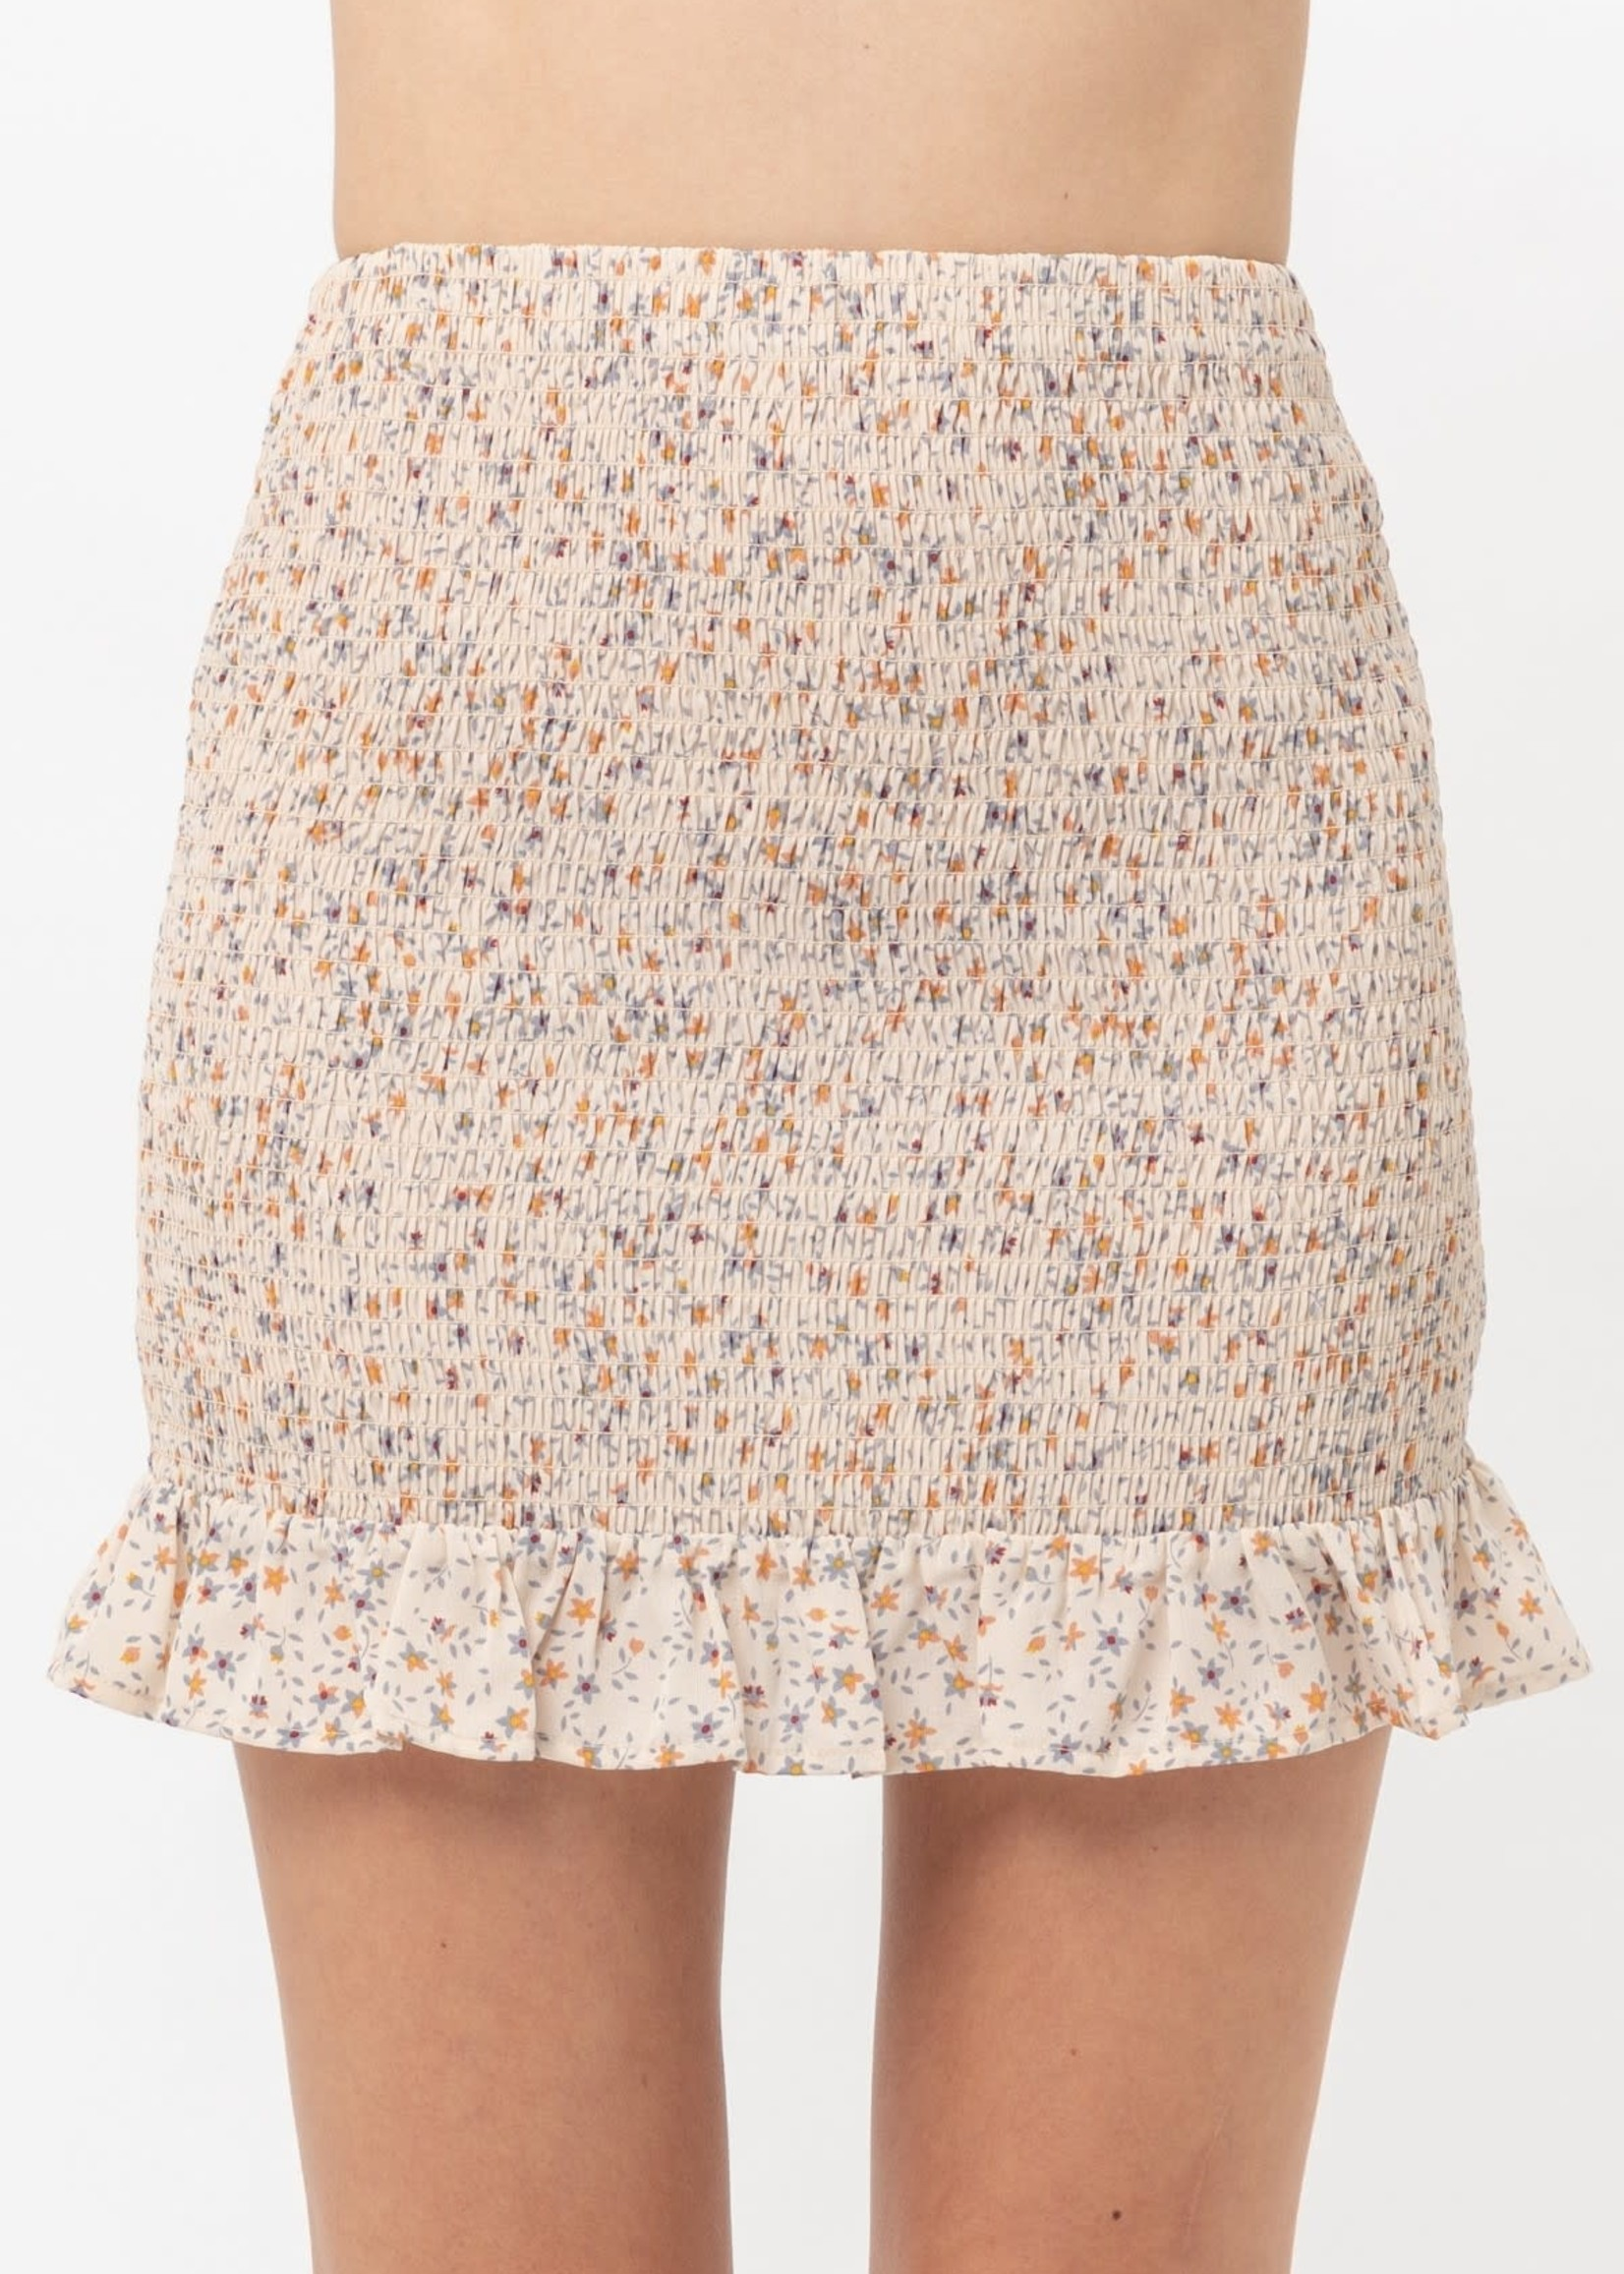 EM & ELLE Pheonix Printed Skirt